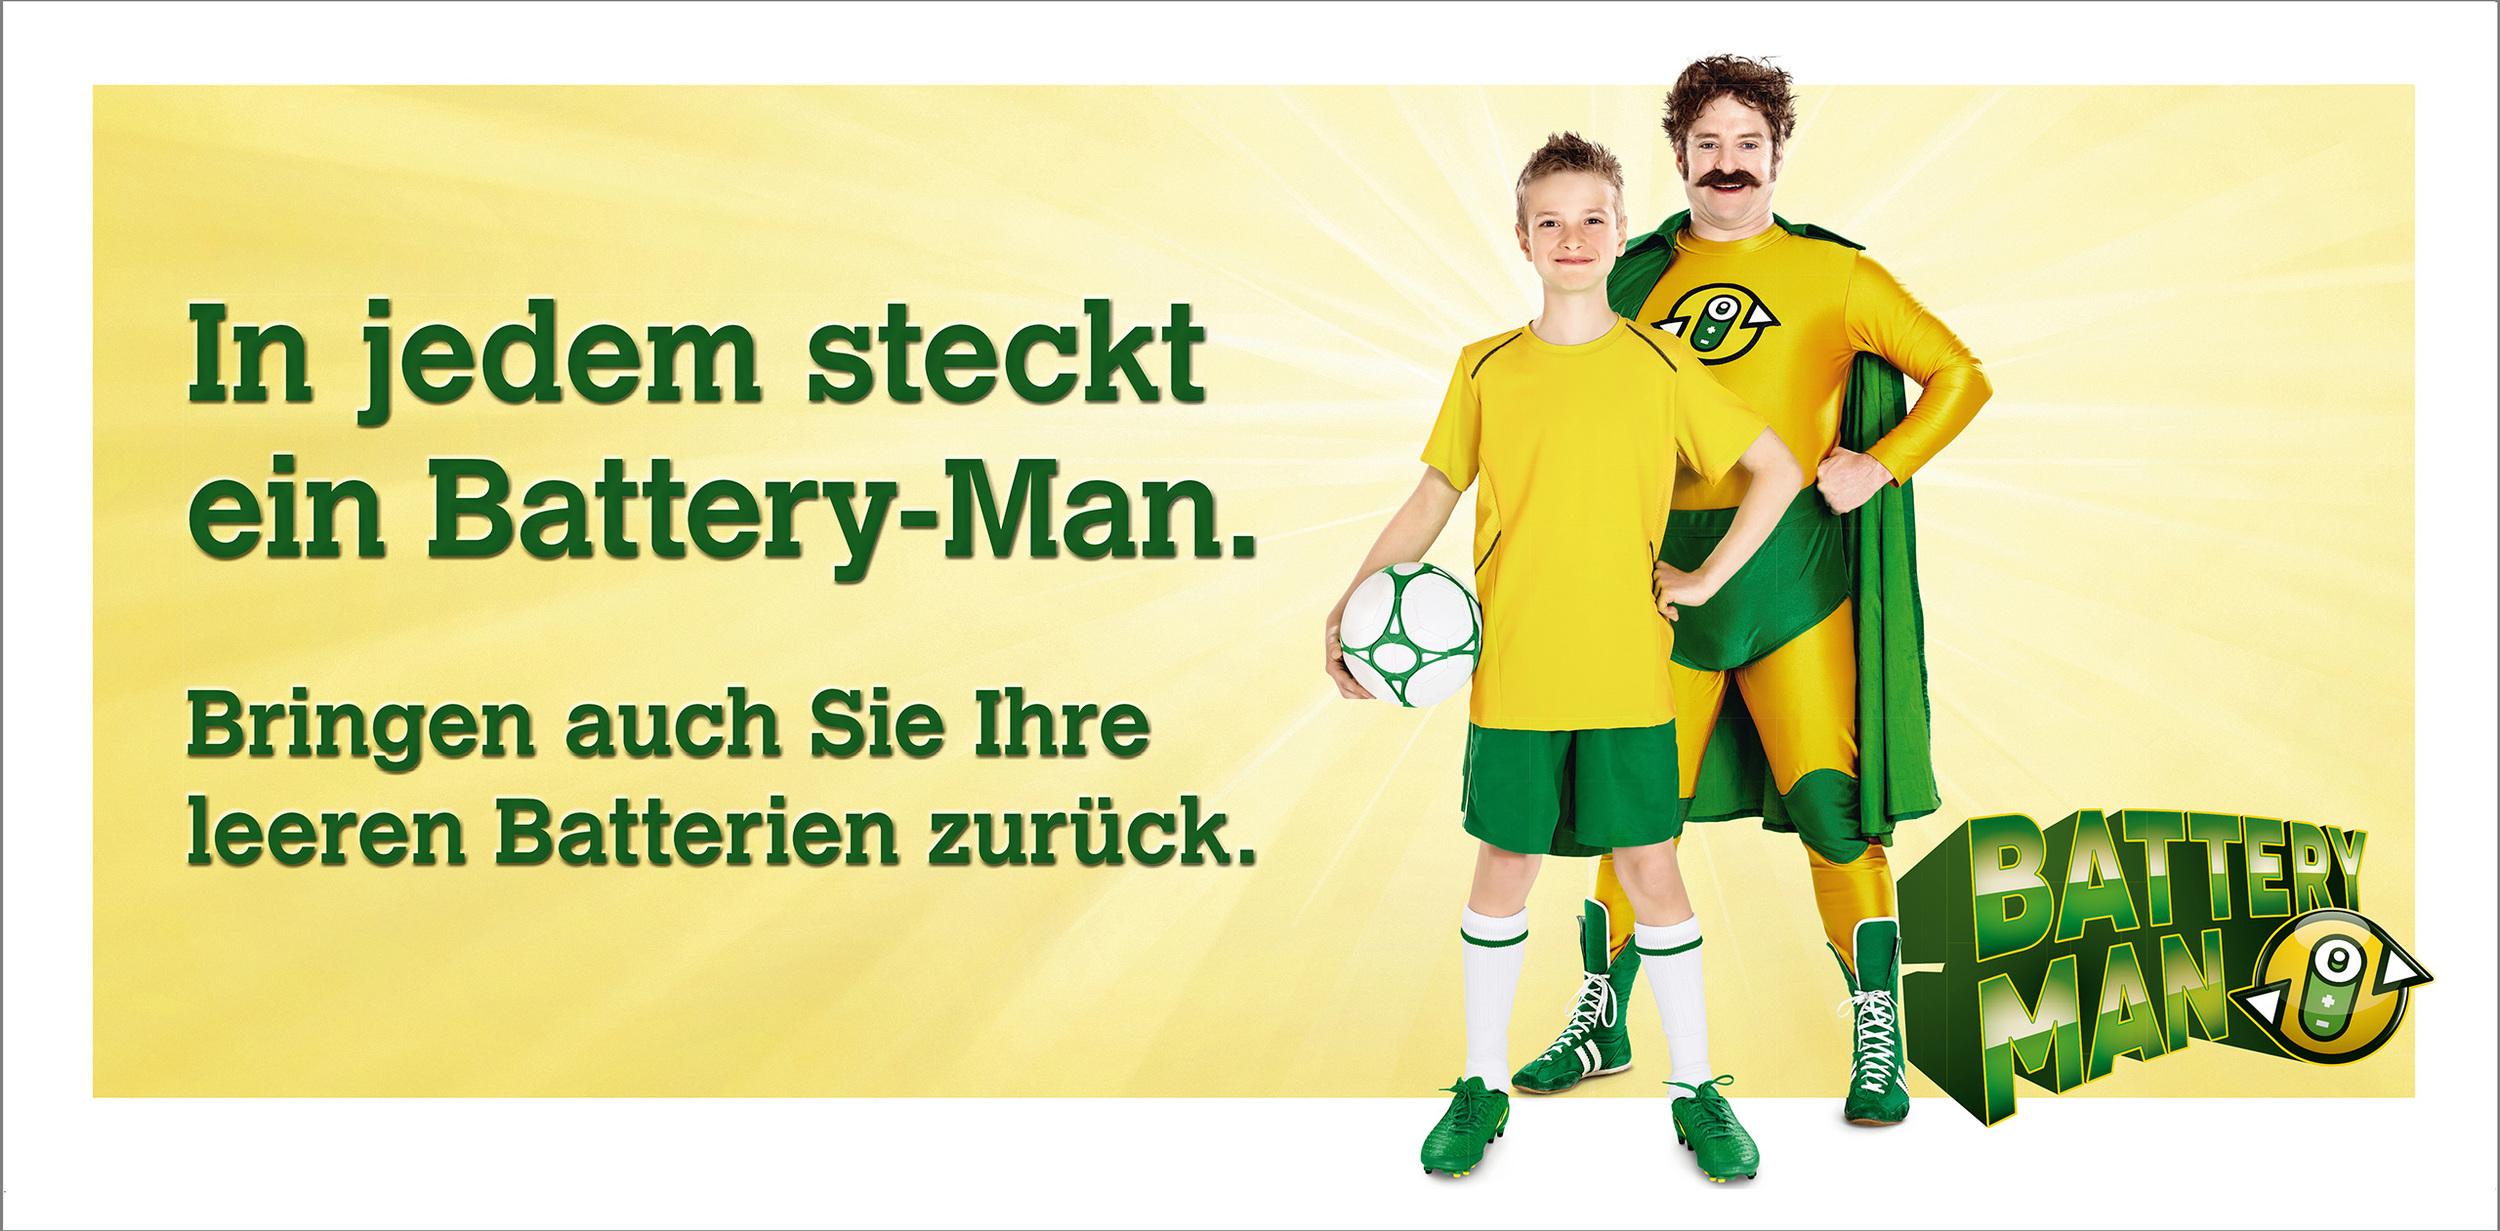 BATTERY-MAN / Kampagne Inobat